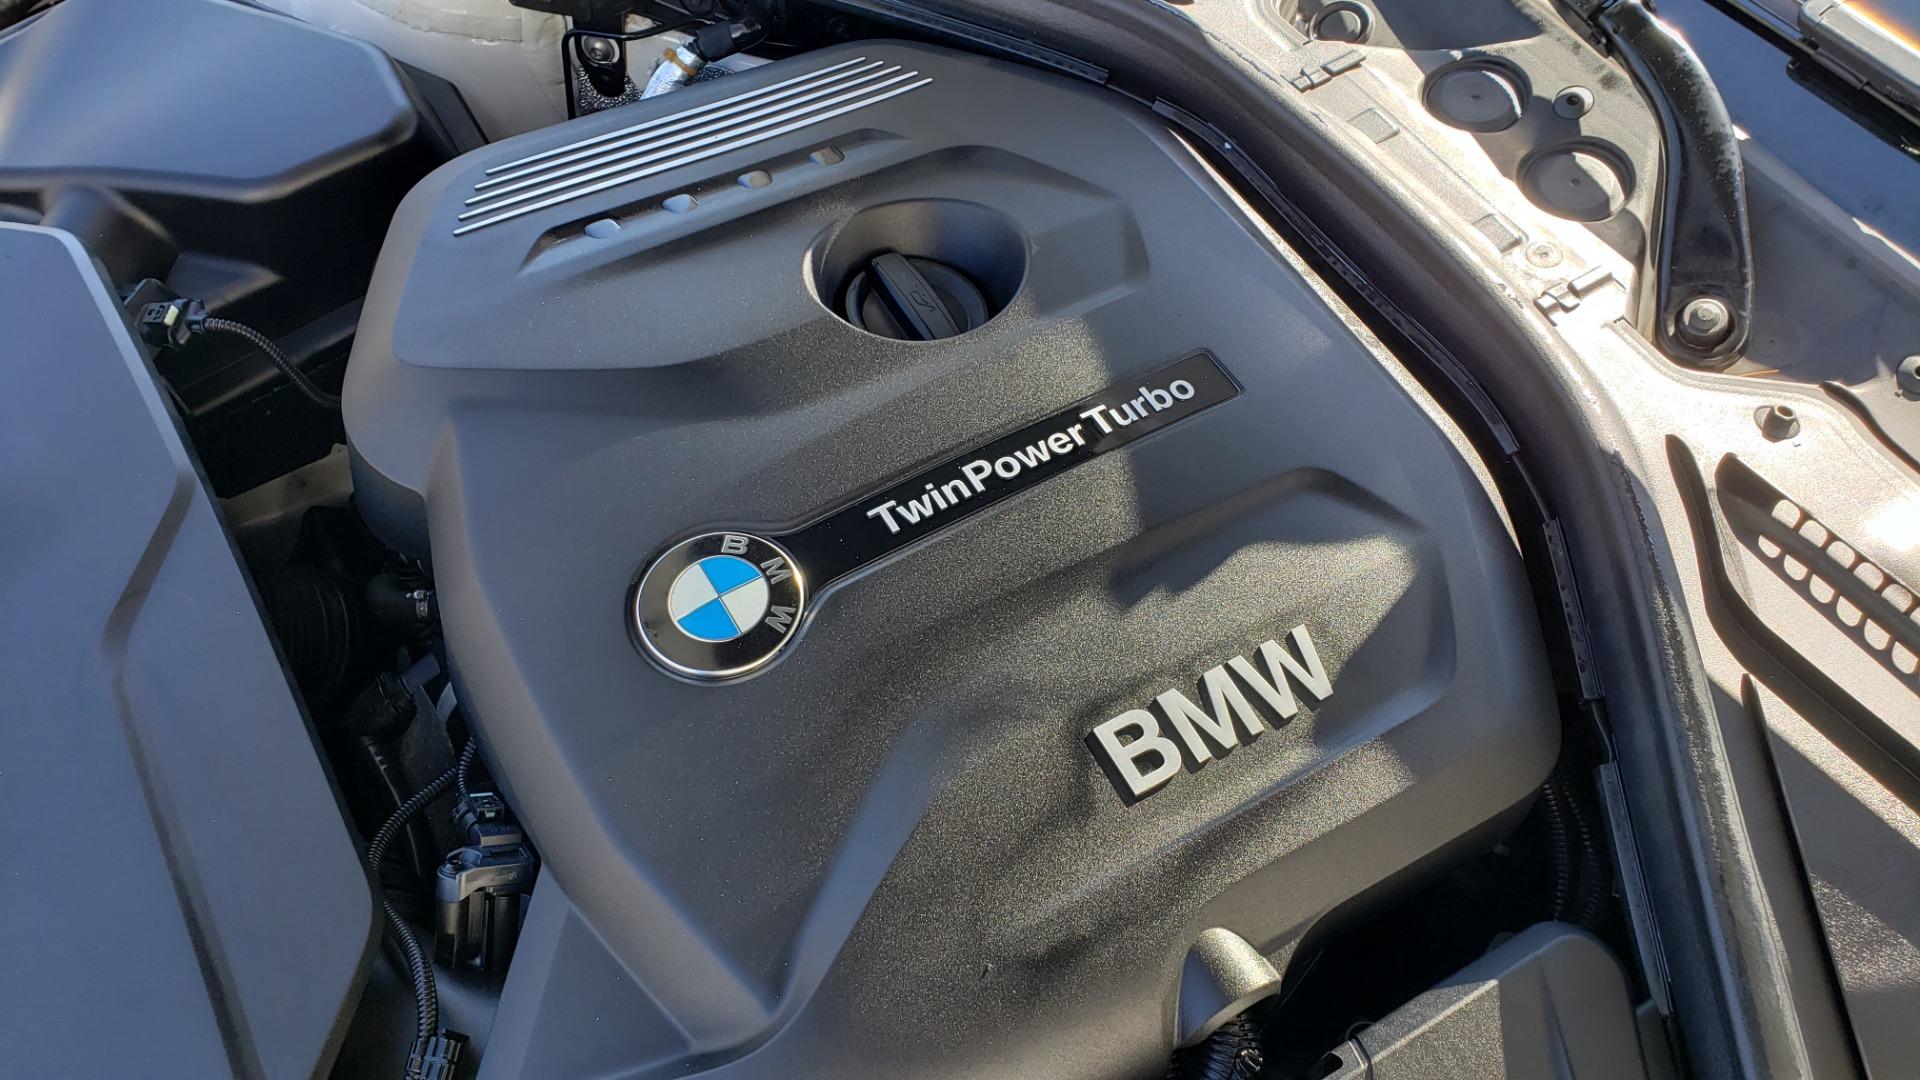 Used 2018 BMW 4 SERIES 430IXDRIVE / PREMIUM / NAV / SUNROOF / ESSENTIALS PKG for sale $28,995 at Formula Imports in Charlotte NC 28227 14